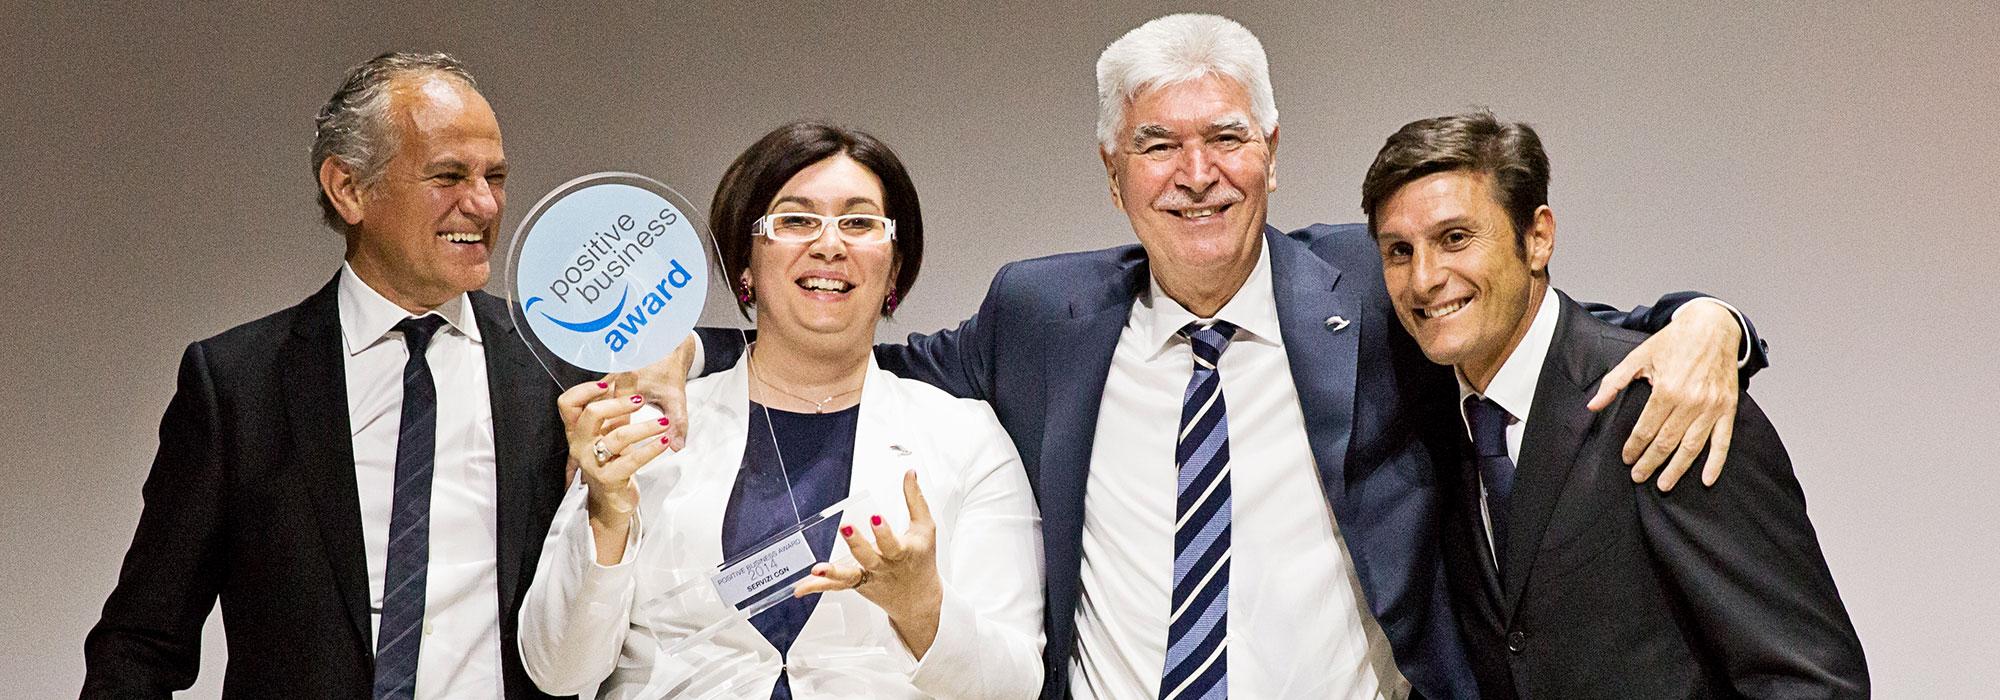 Positive Business Award 2014